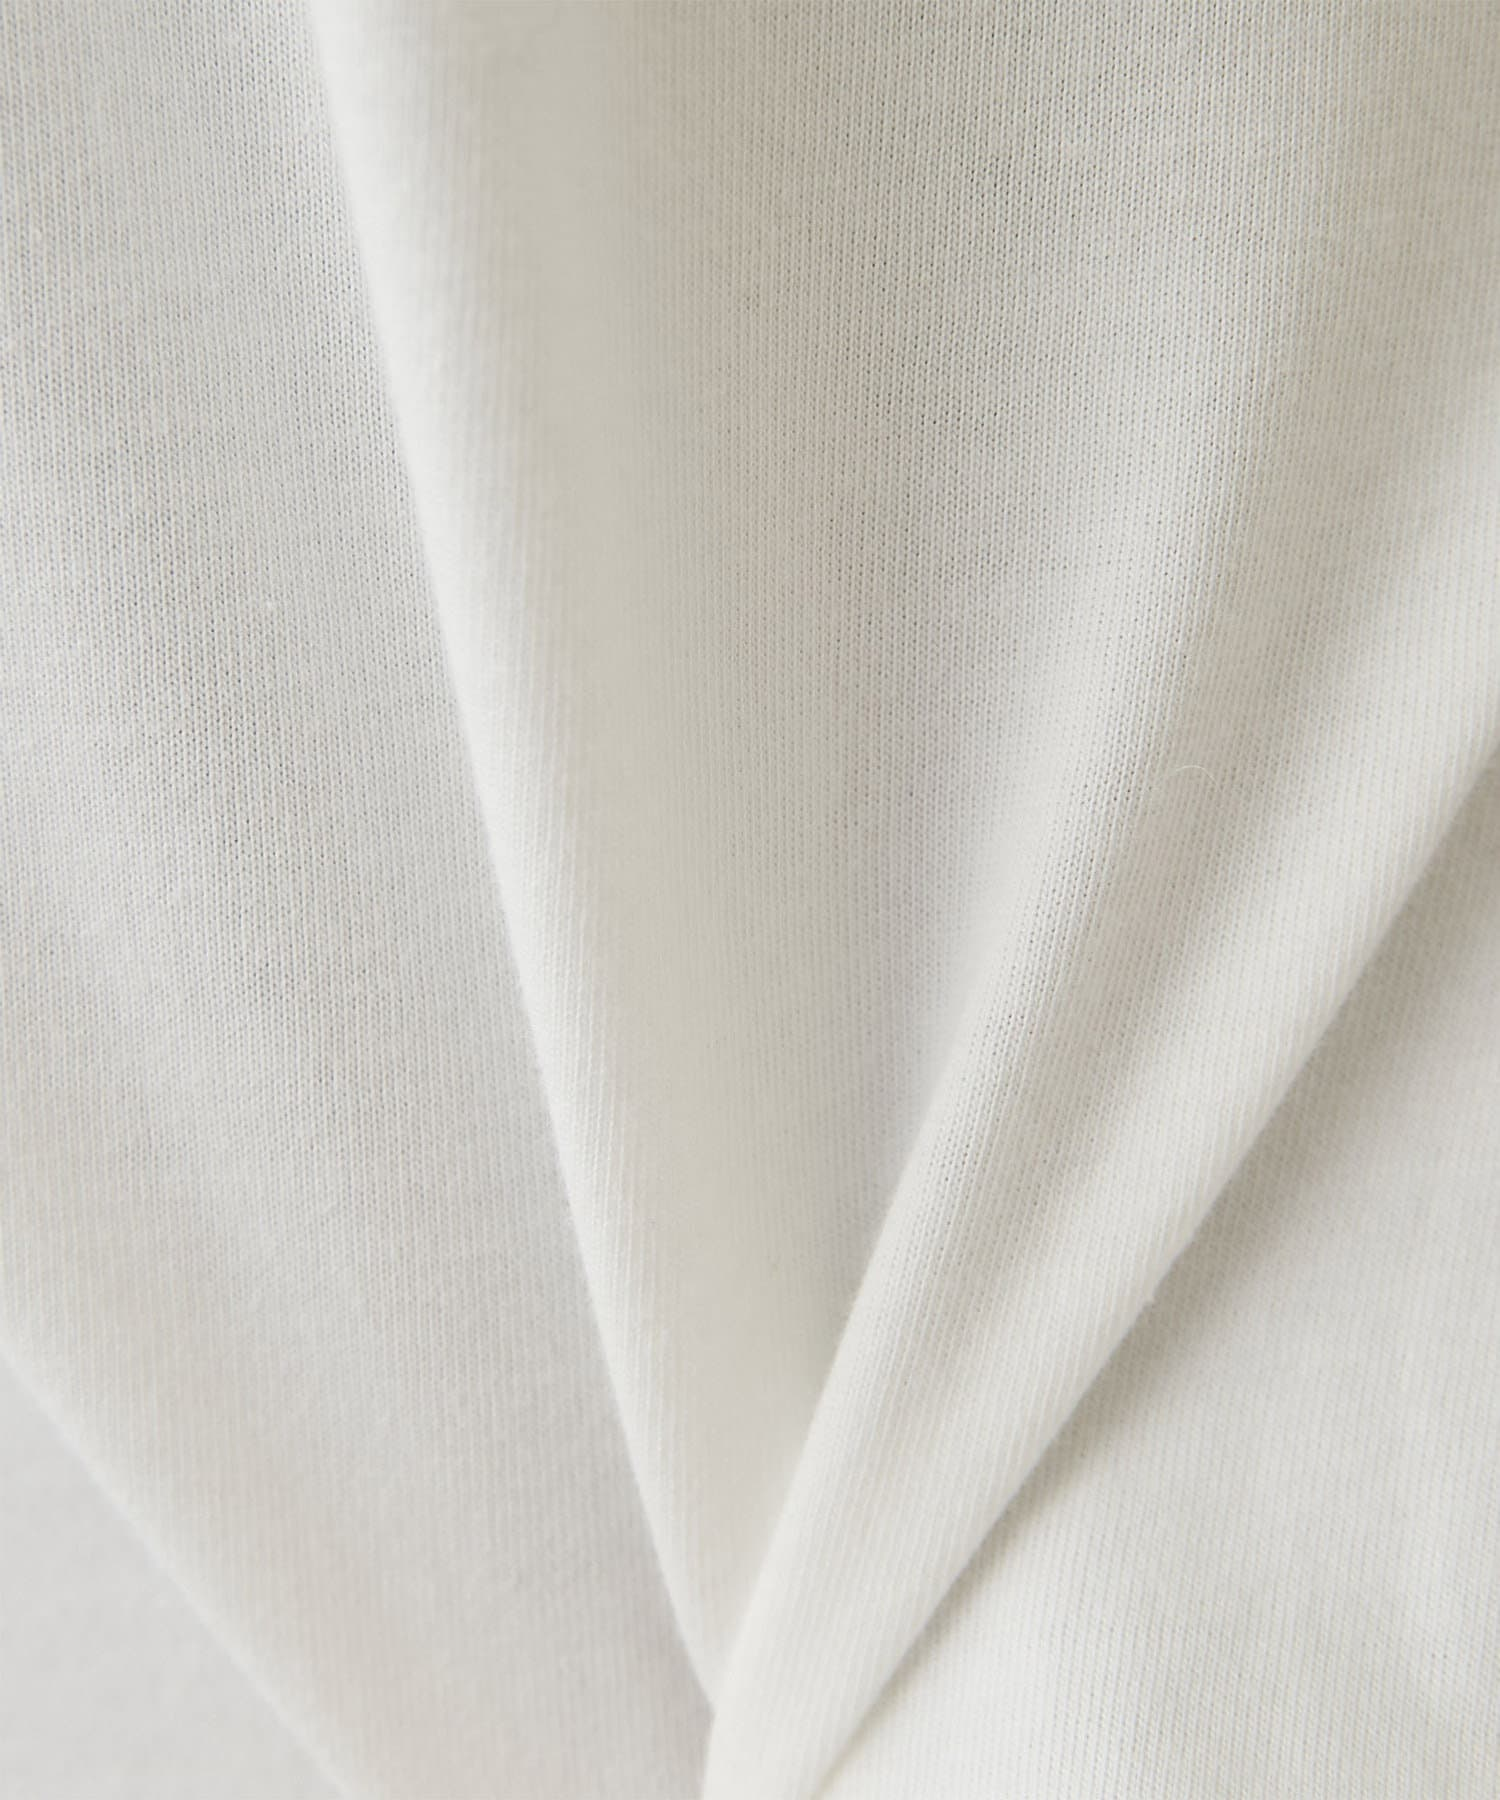 GALLARDAGALANTE(ガリャルダガランテ) オーガニックコットンスリットTシャツ